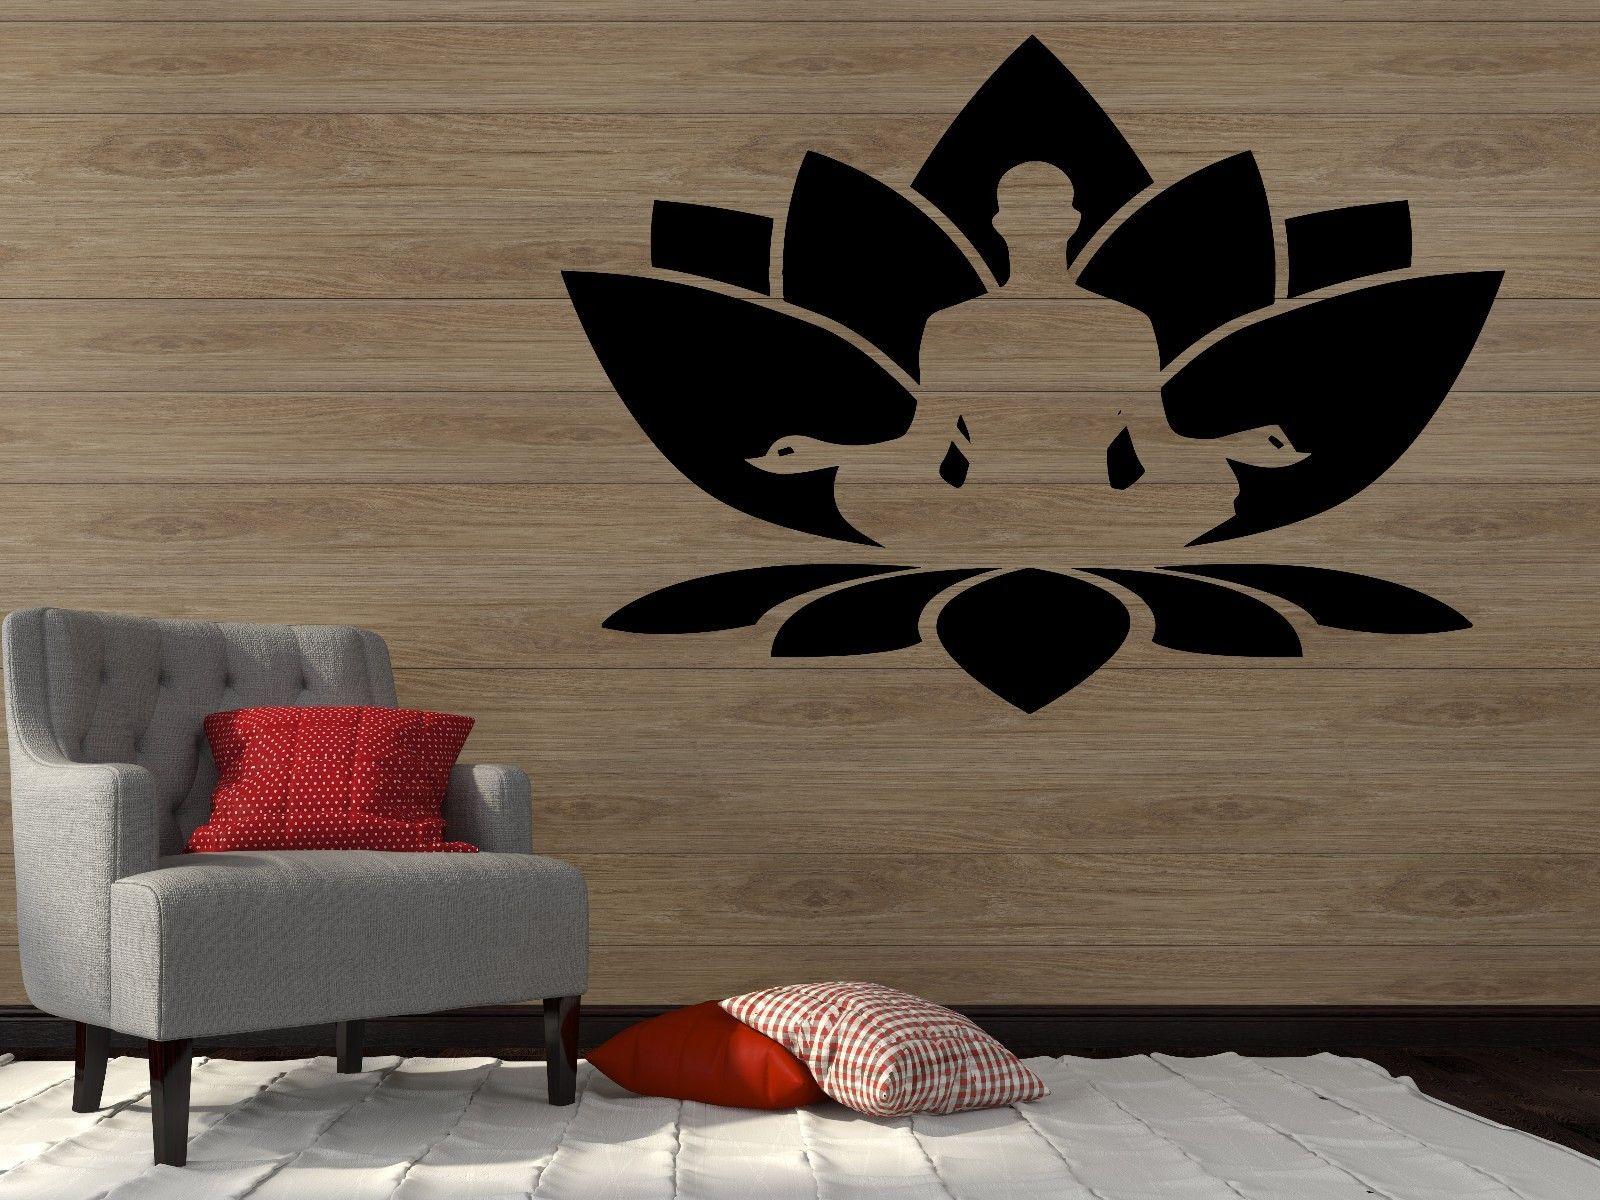 2016 new yoga Wall Vinyl Sticker Decal Lotus Flower Seated Buddha Meditation Yoga Studio free shipping(China (Mainland))